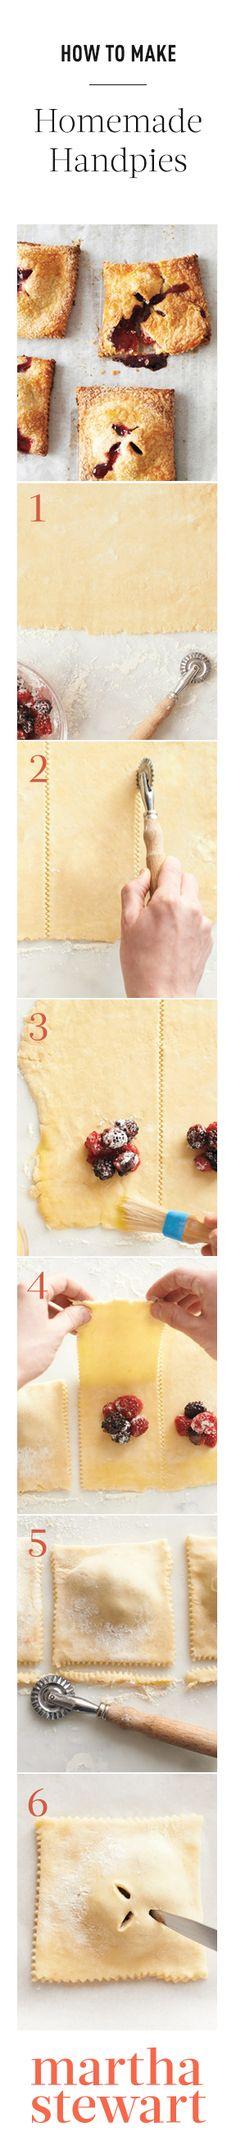 How To Make: Homemade Handpies